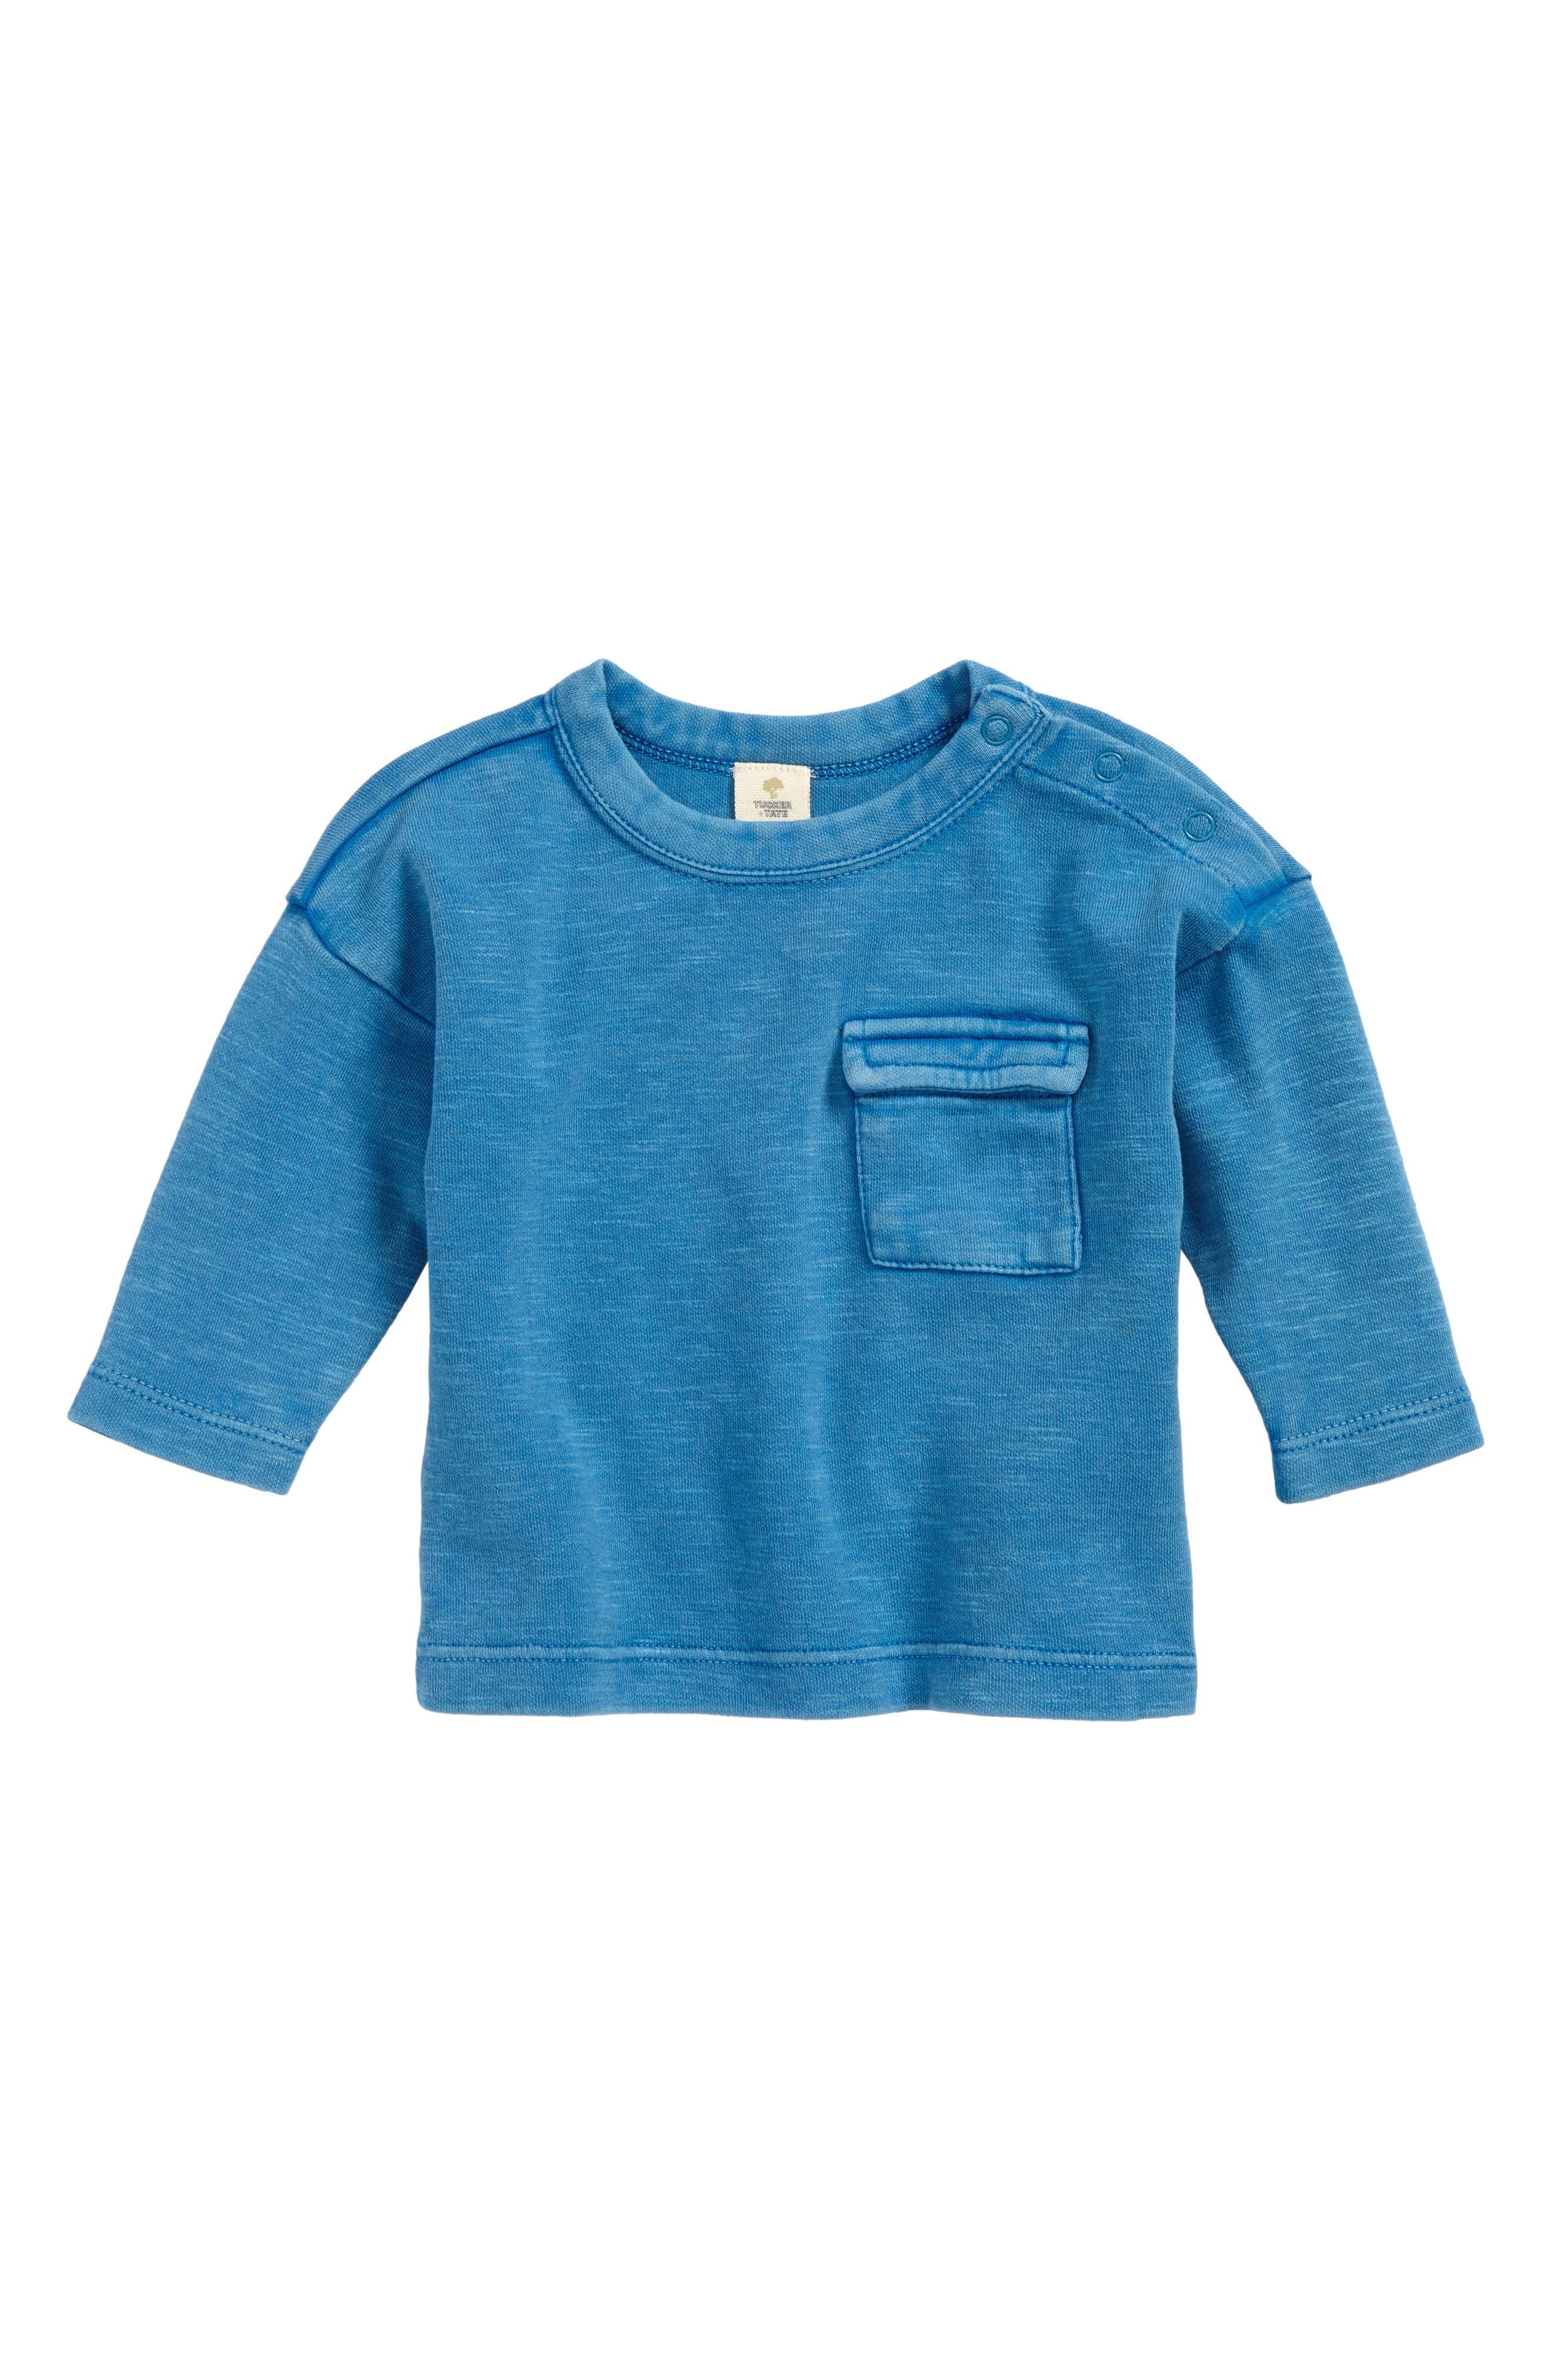 Tucker + Tate Drop Shoulder T-Shirt (Baby Boys)